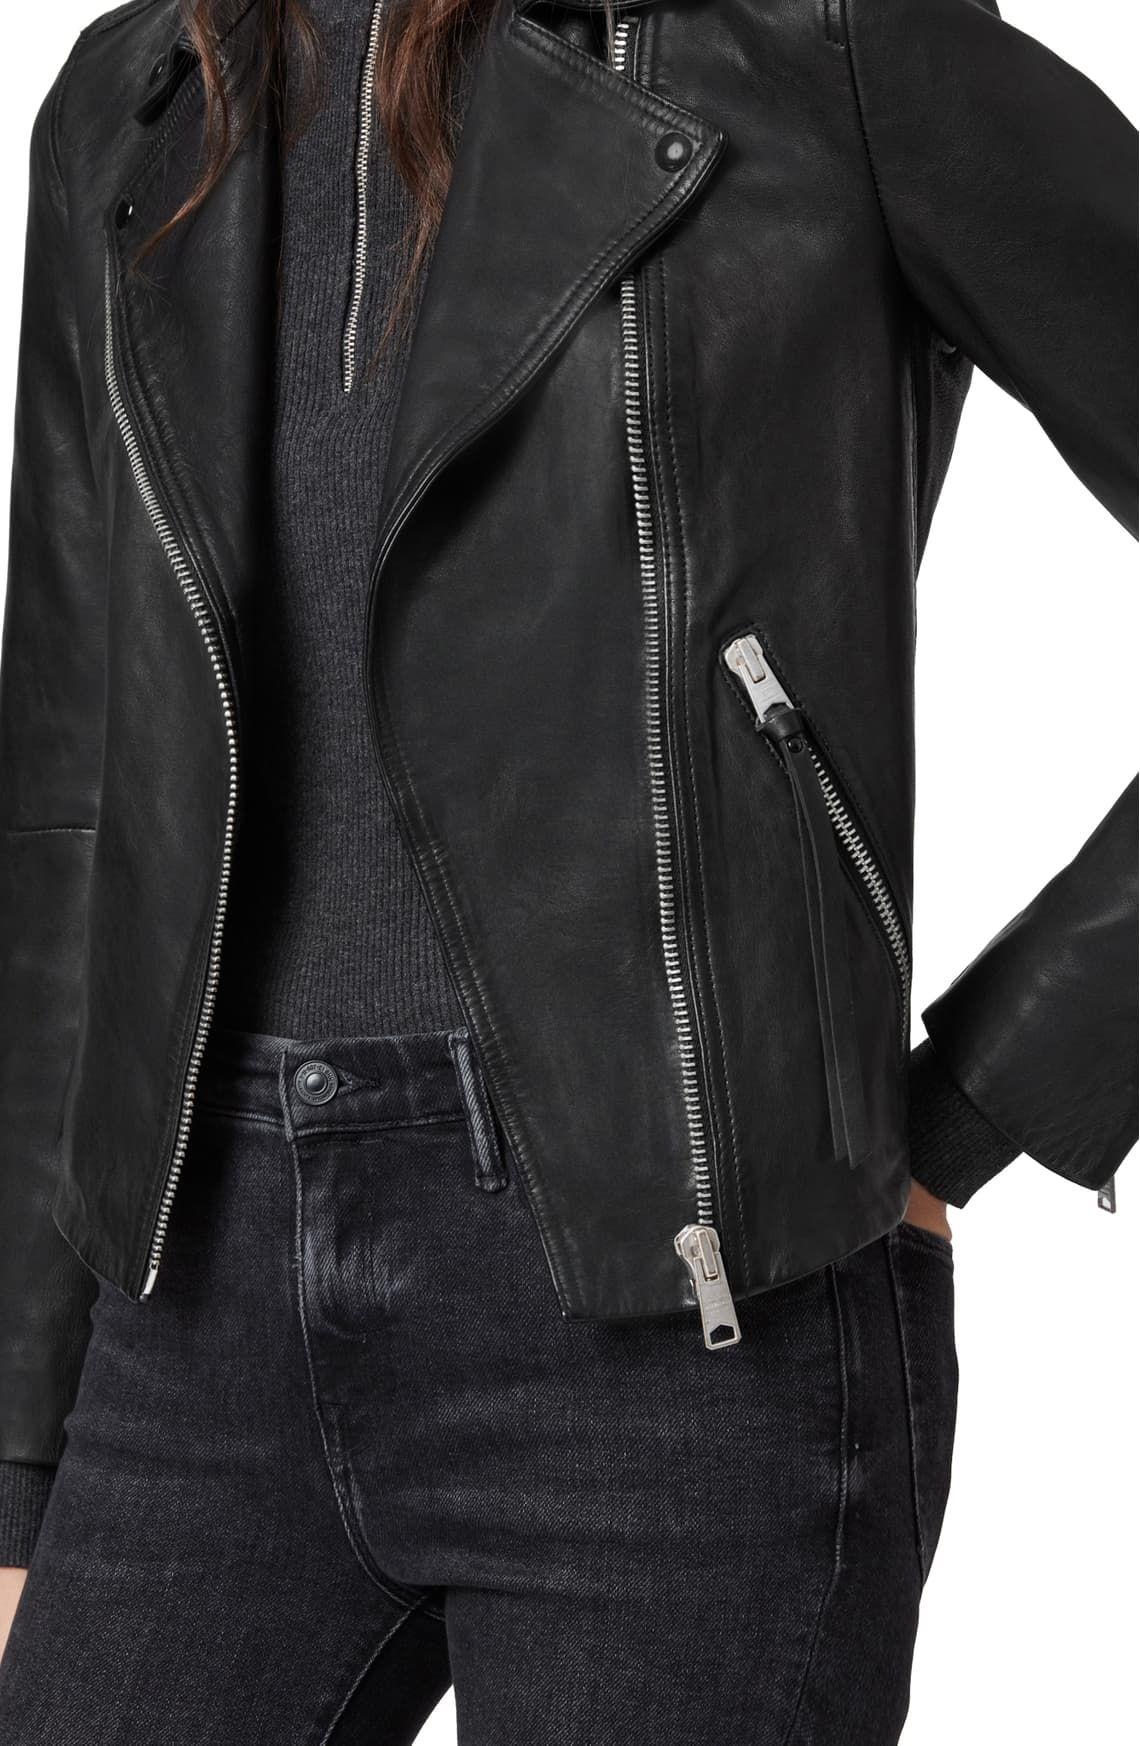 Allsaints Dalby Leather Biker Jacket Nordstrom In 2021 Stylish Leather Jacket Leather Jacket Rock Jackets [ 1746 x 1140 Pixel ]